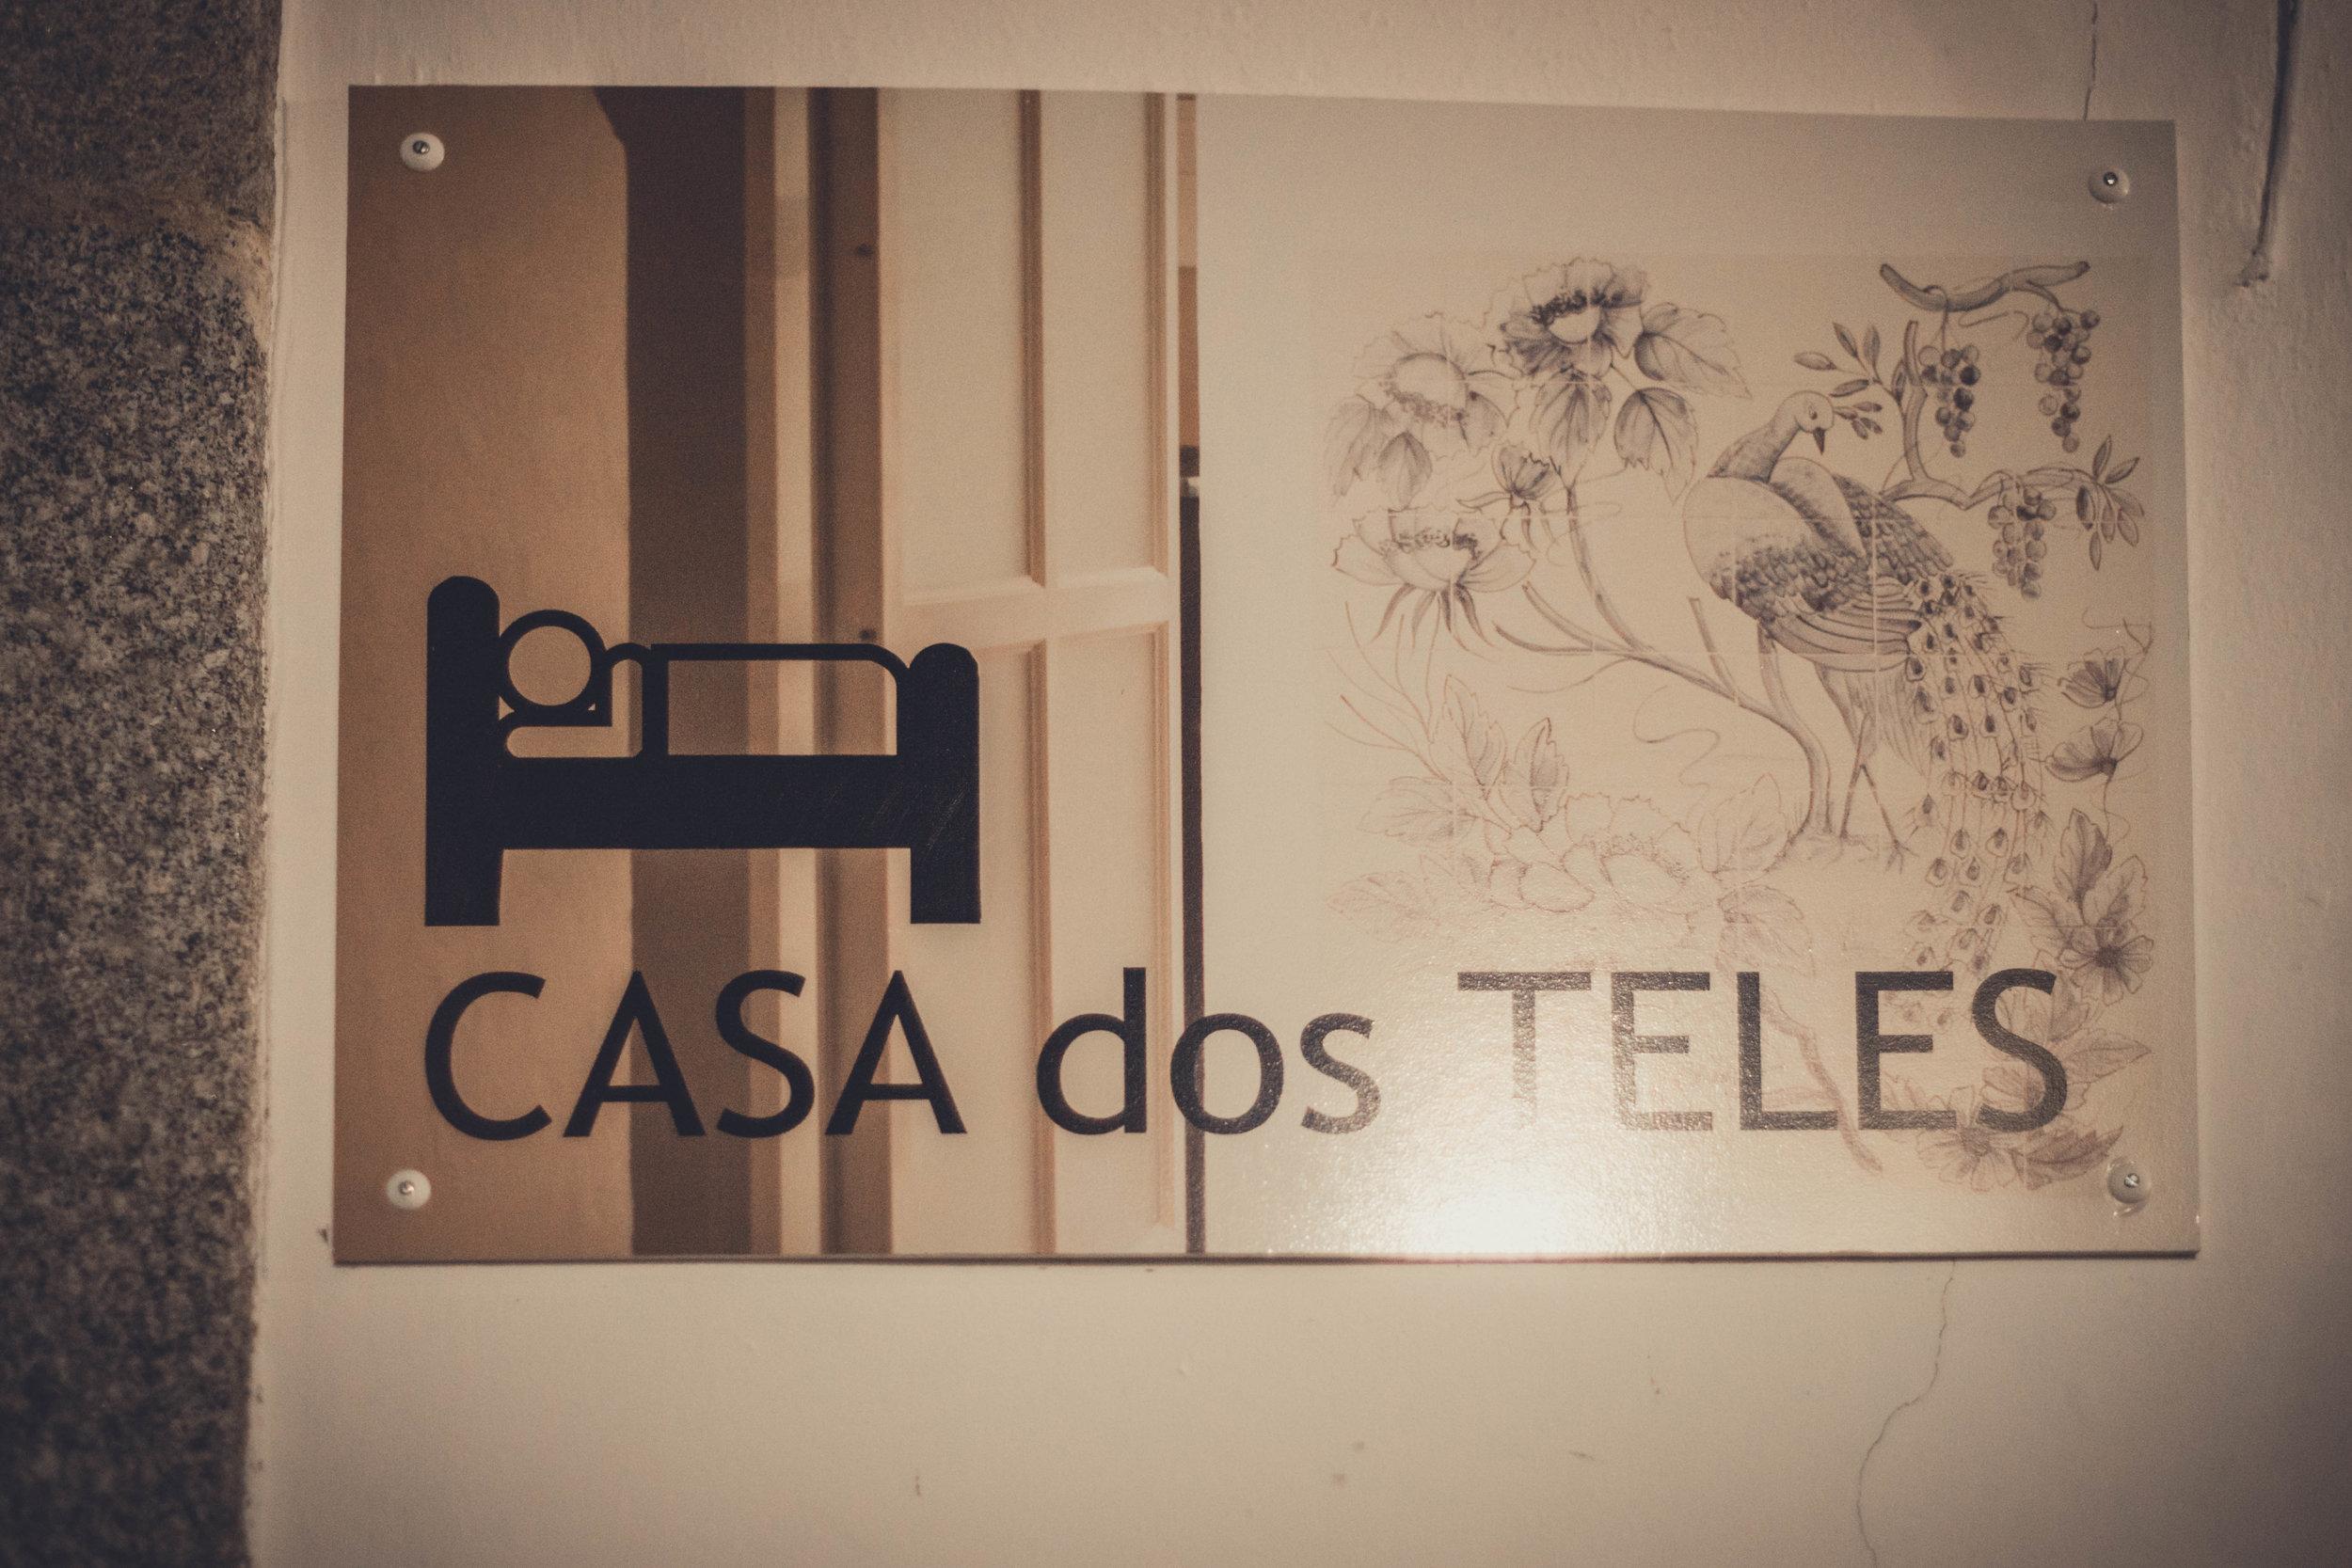 Casa dos Teles. Guest house.Evora. Roman Ruins. Portugal. Alentejo. Piliers. Roman city. ancient roman town. Blue sky. travel. adventure. history. historical. sign.jpg